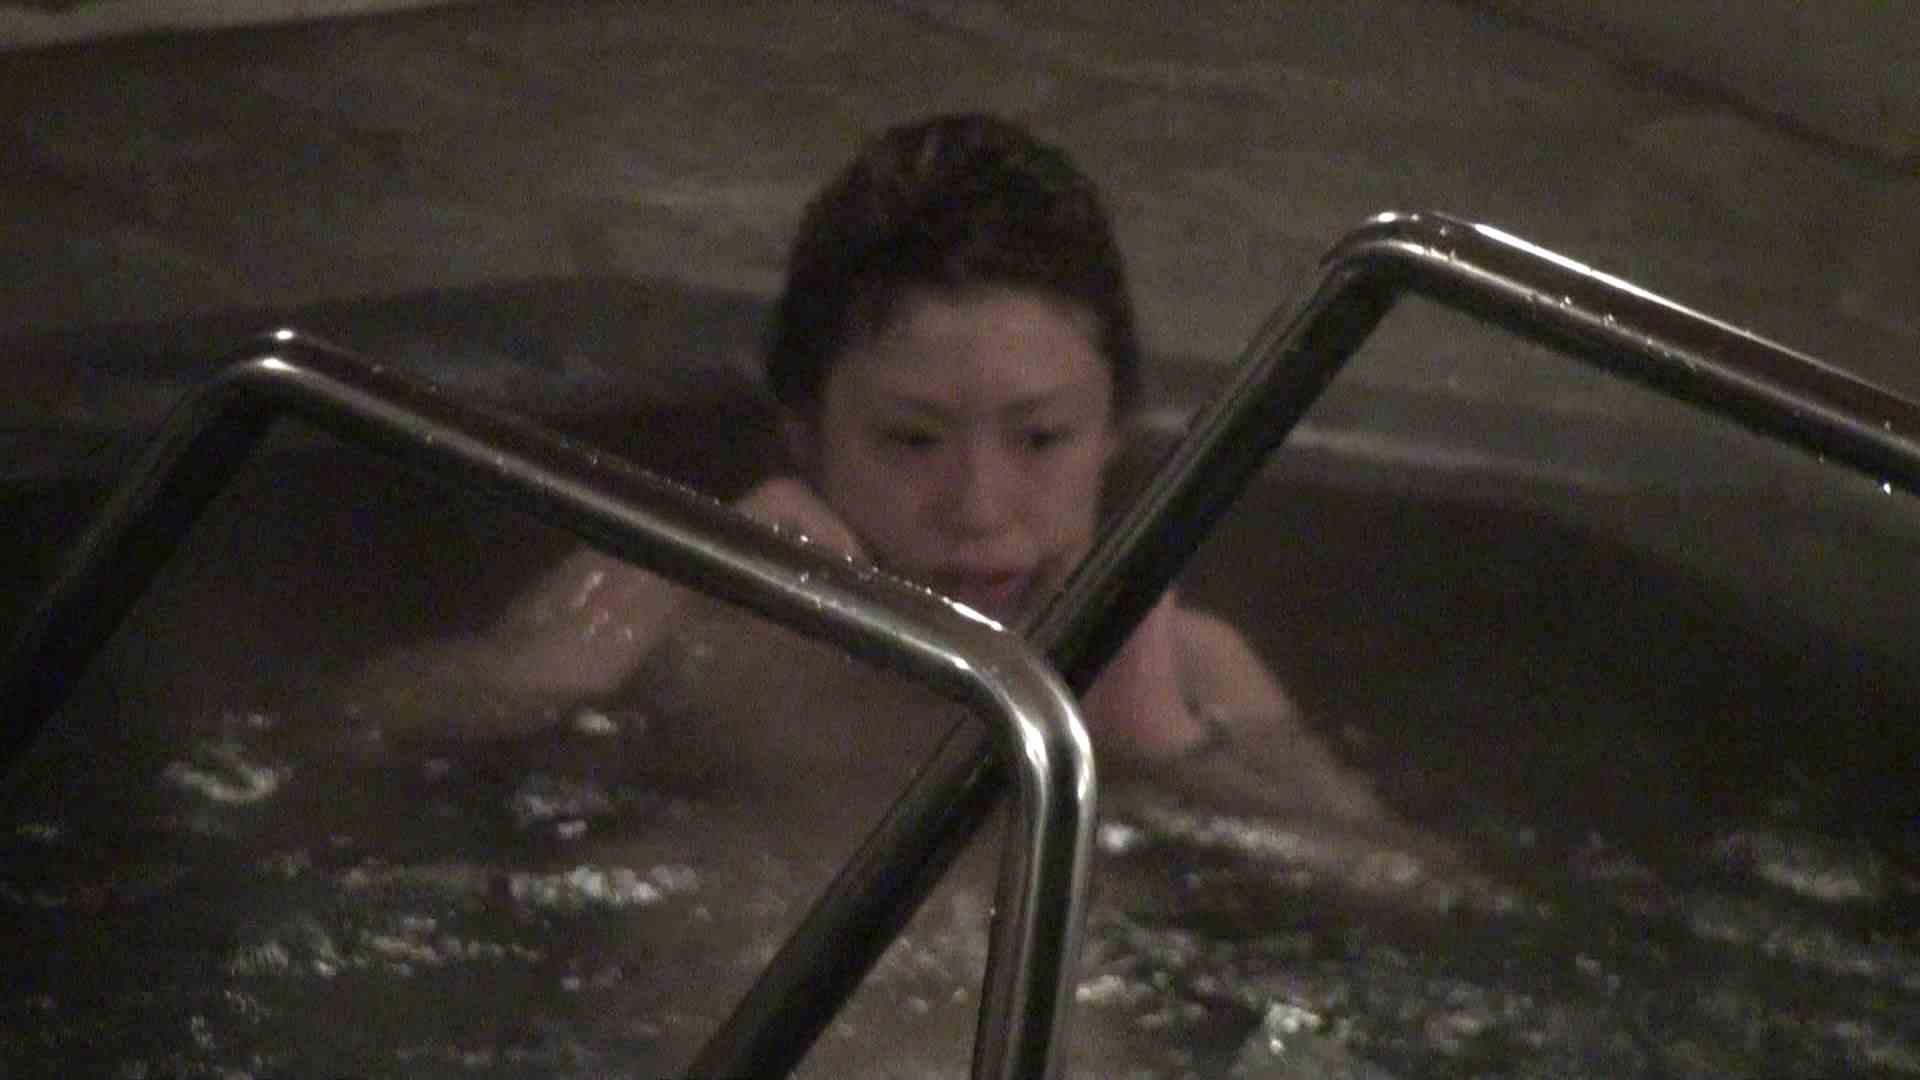 Aquaな露天風呂Vol.434 0  81連発 52